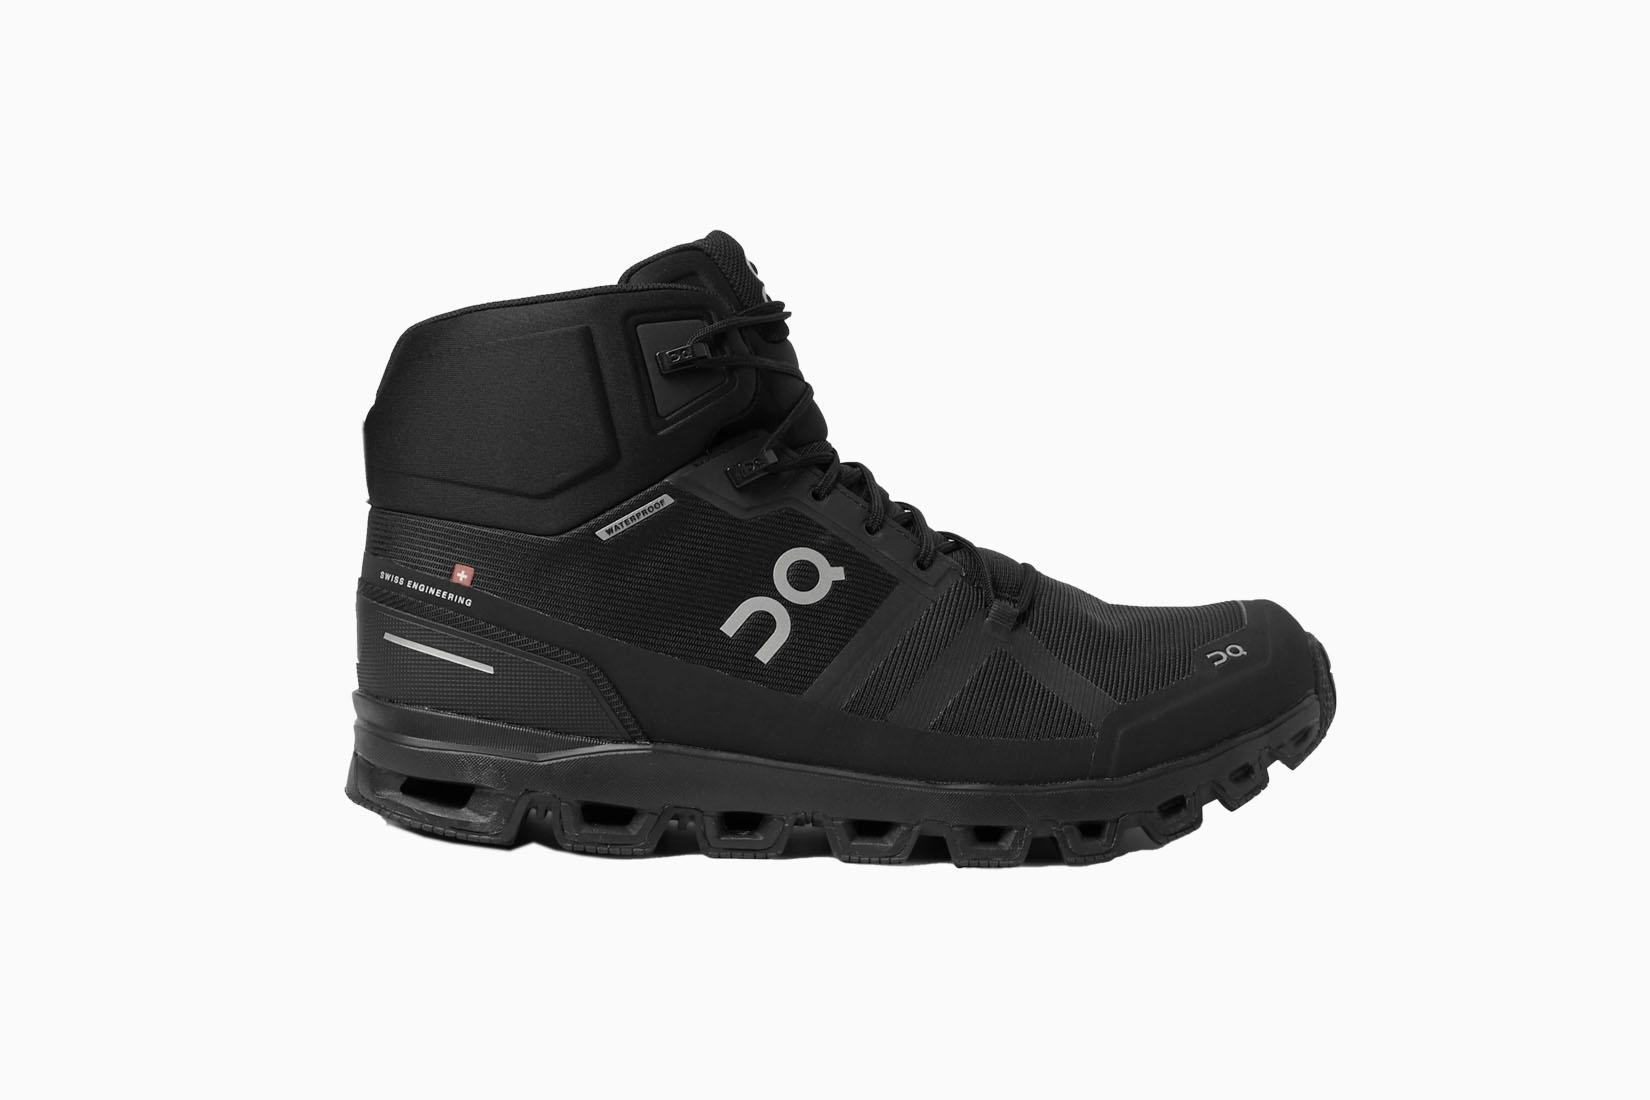 best waterproof shoes men on review Luxe Digital